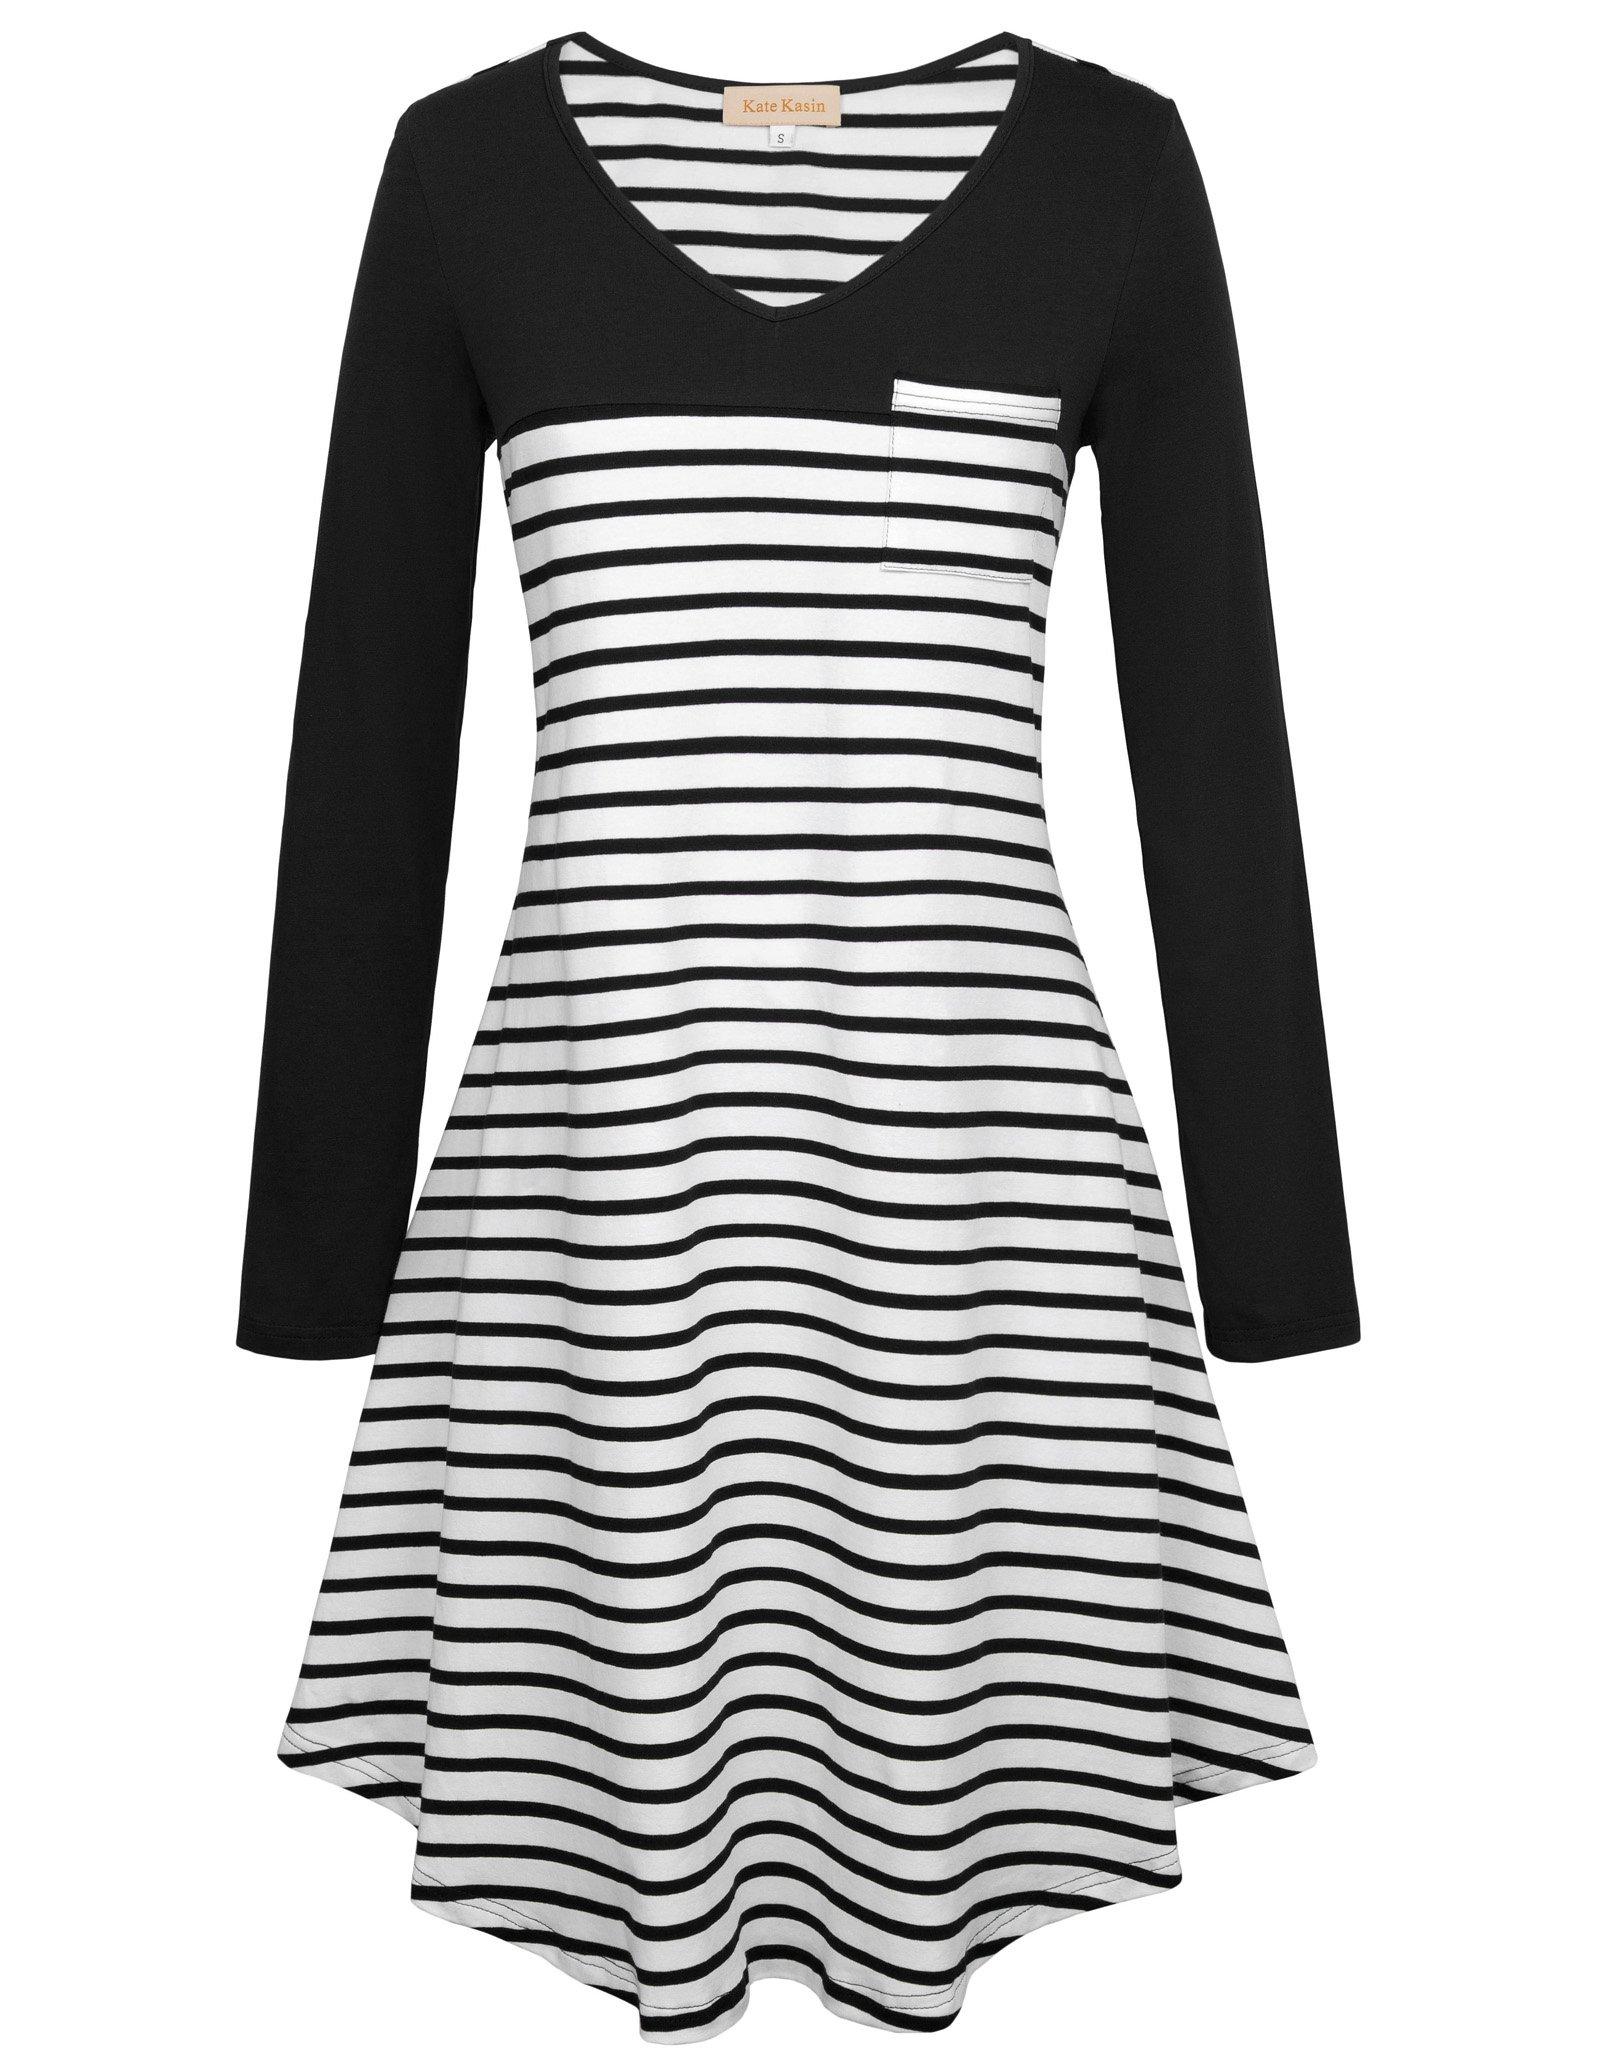 d67dce720cf Kate Kasin Women Long Sleeve Swing T-Shirt Dress V-Neck Stripe Casual Dress  Tunic S,KK781-1